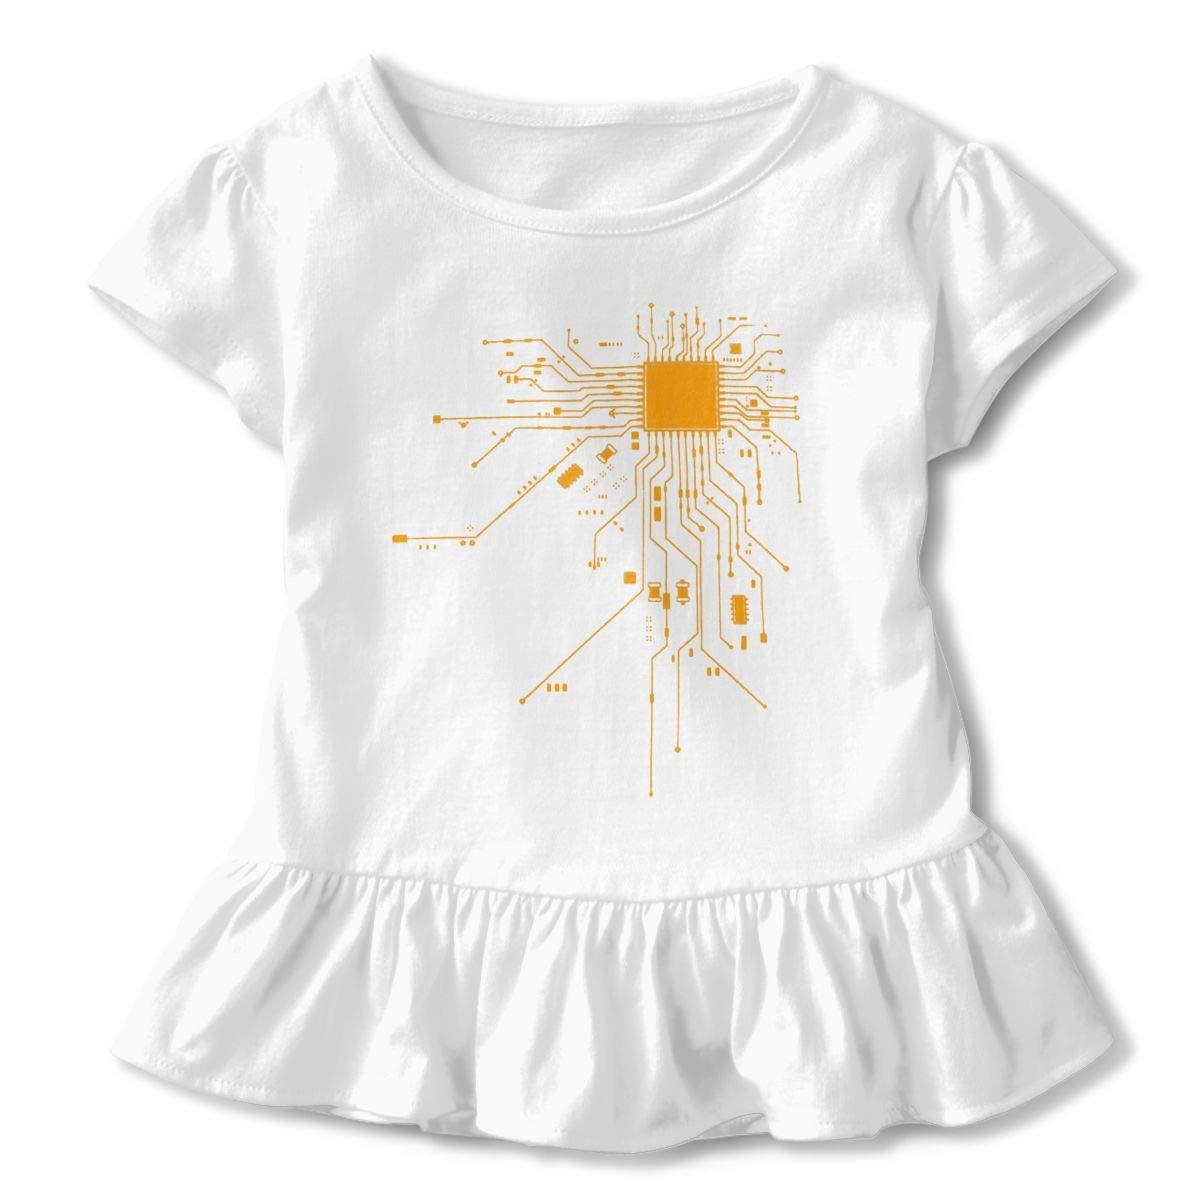 Computer Chip CPU CORE Heart Toddler Little Girl Floral Ruffled Sleeve T-Shirt Tops